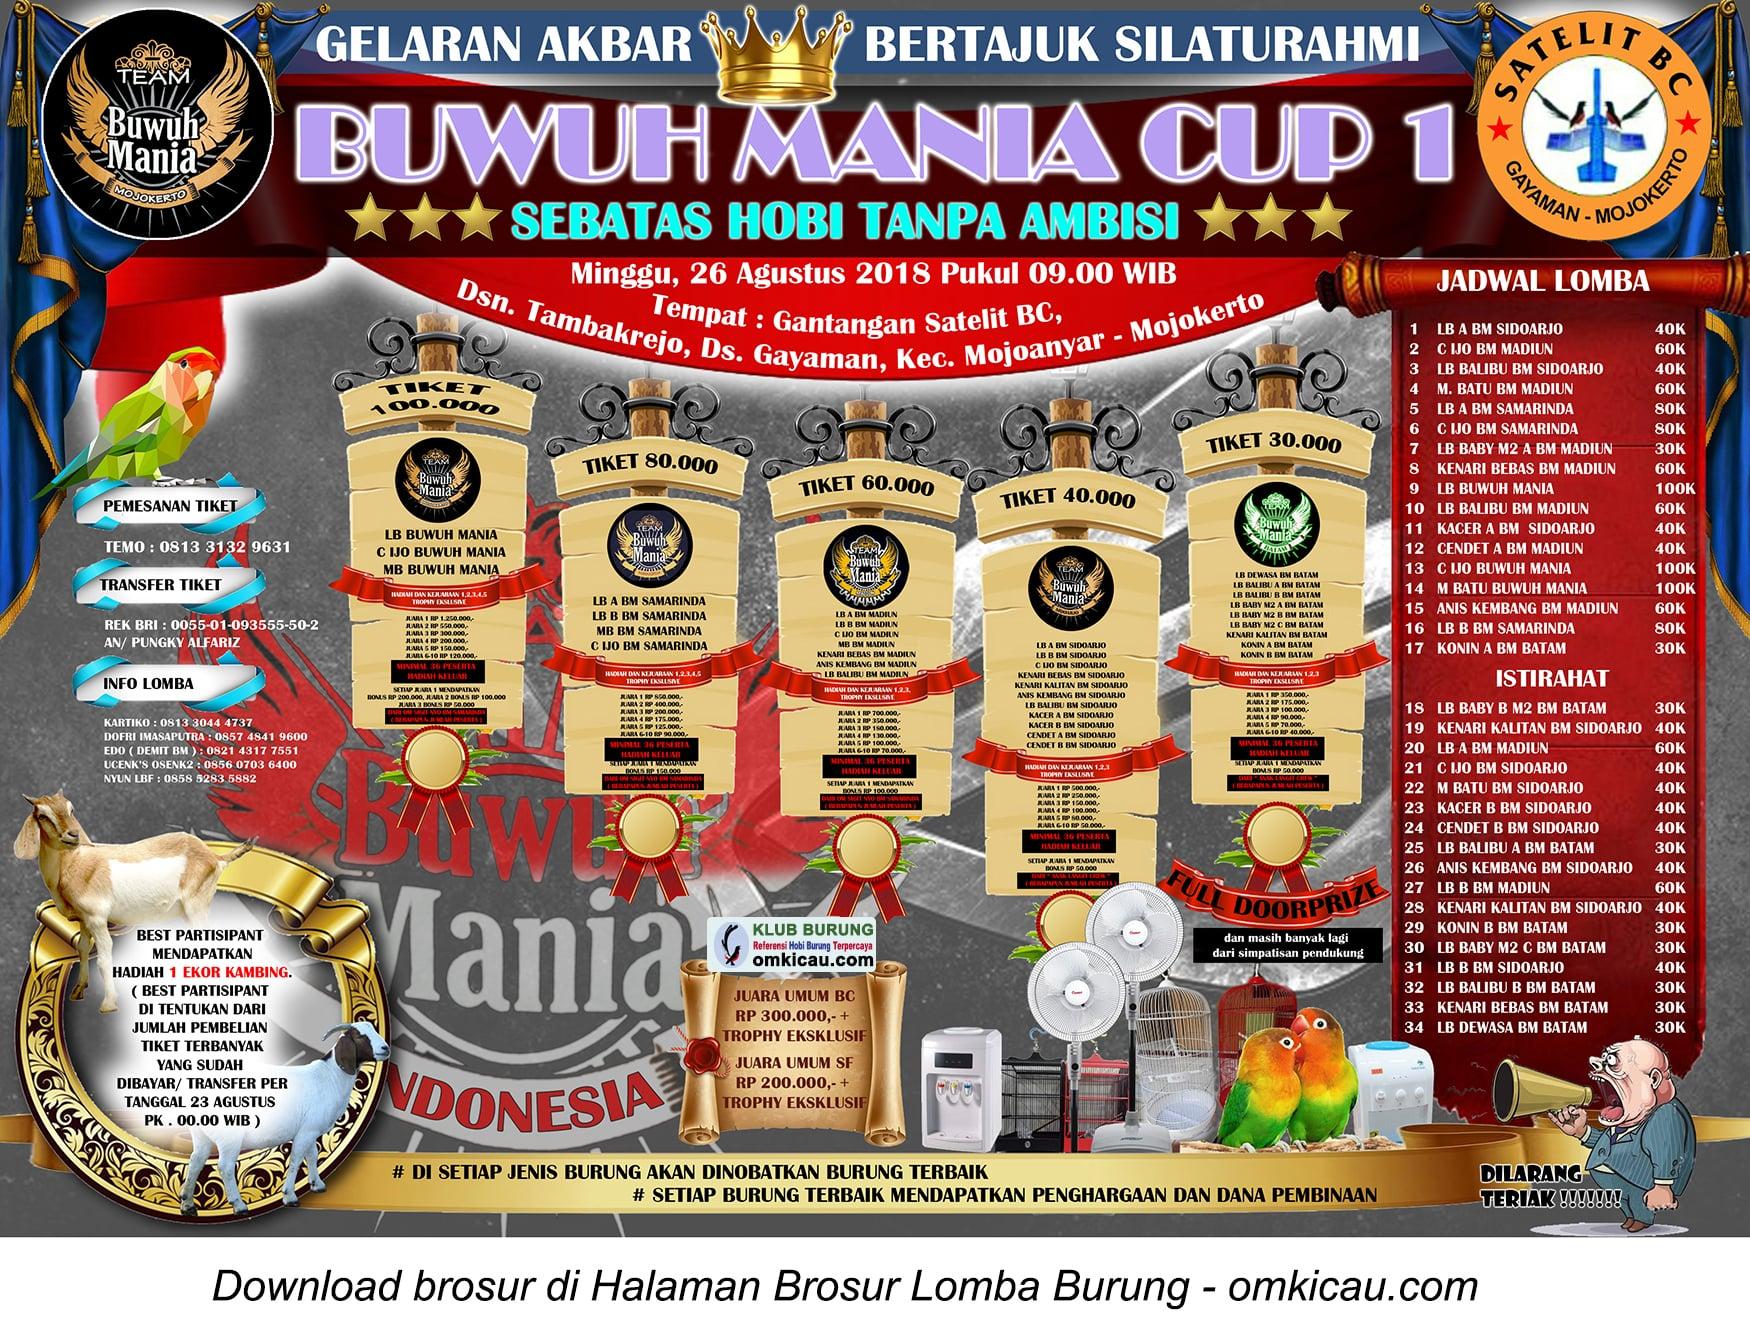 Silaturahmi Buwuh Mania Cup 1